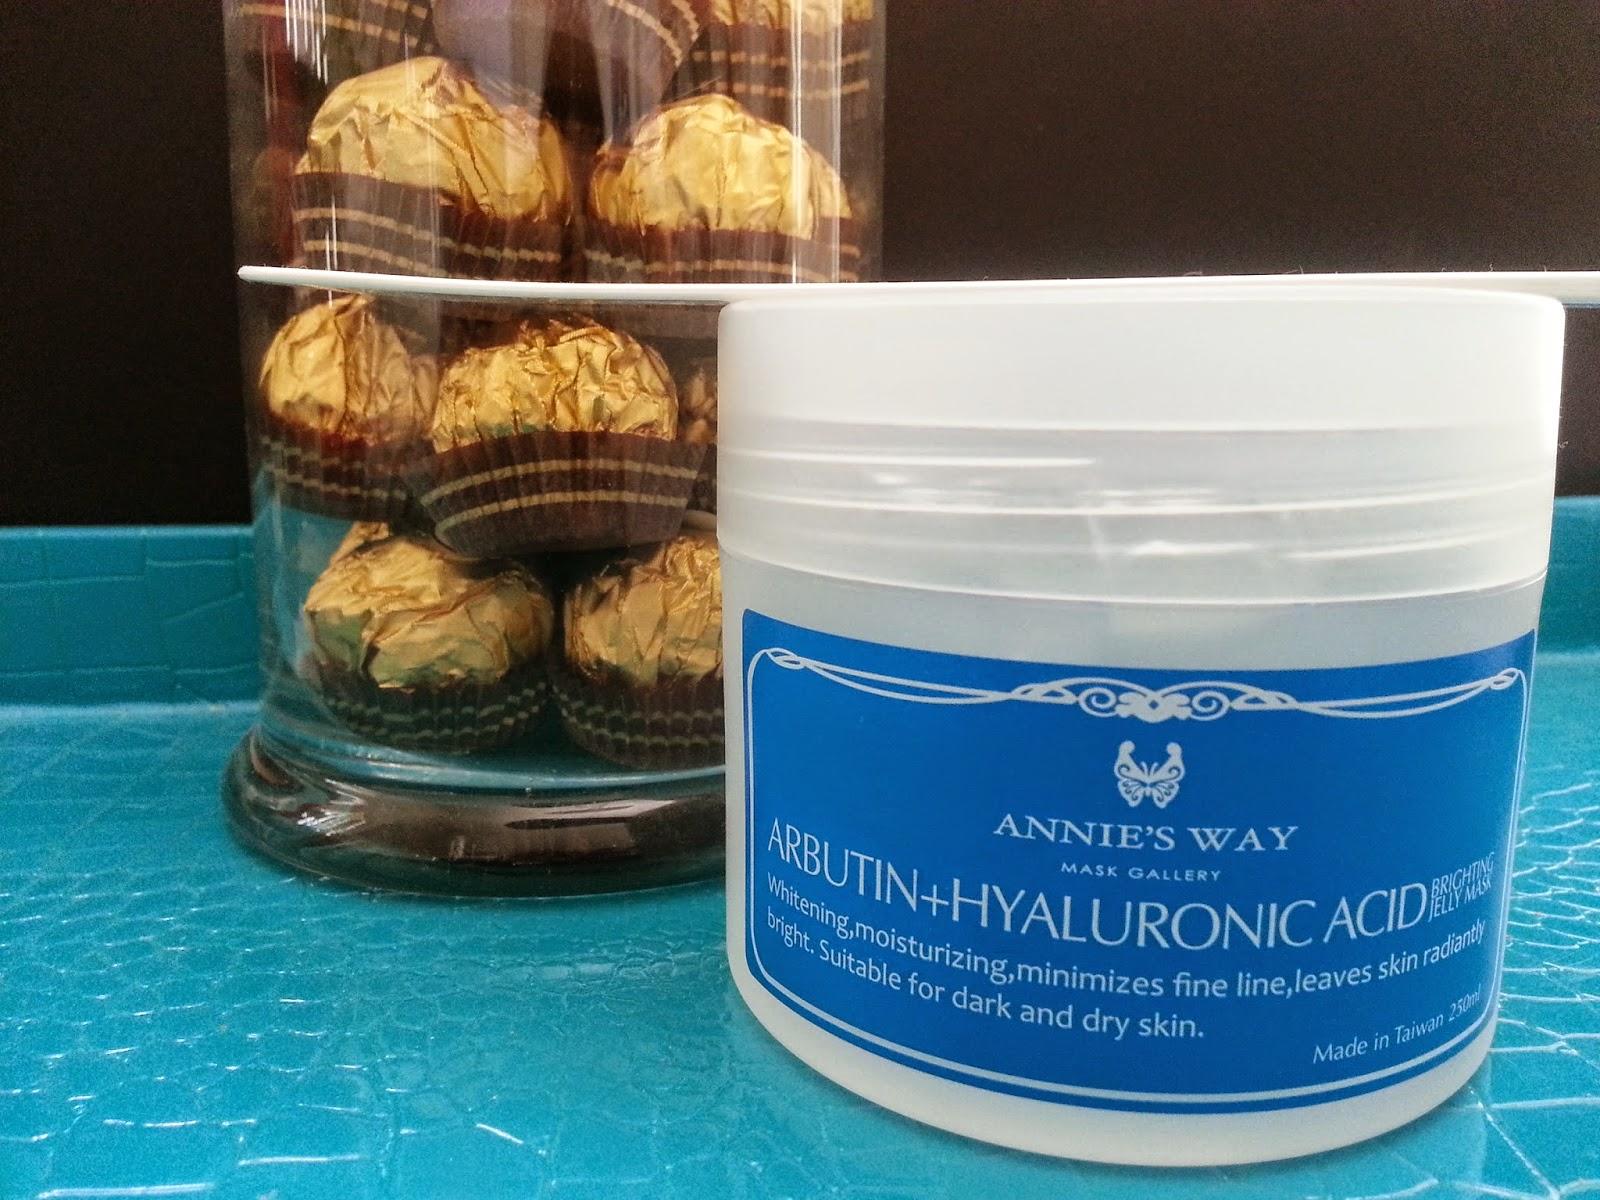 Annie's Way Arbutin + Hyaluronic Acid Brightening Jelly Mask